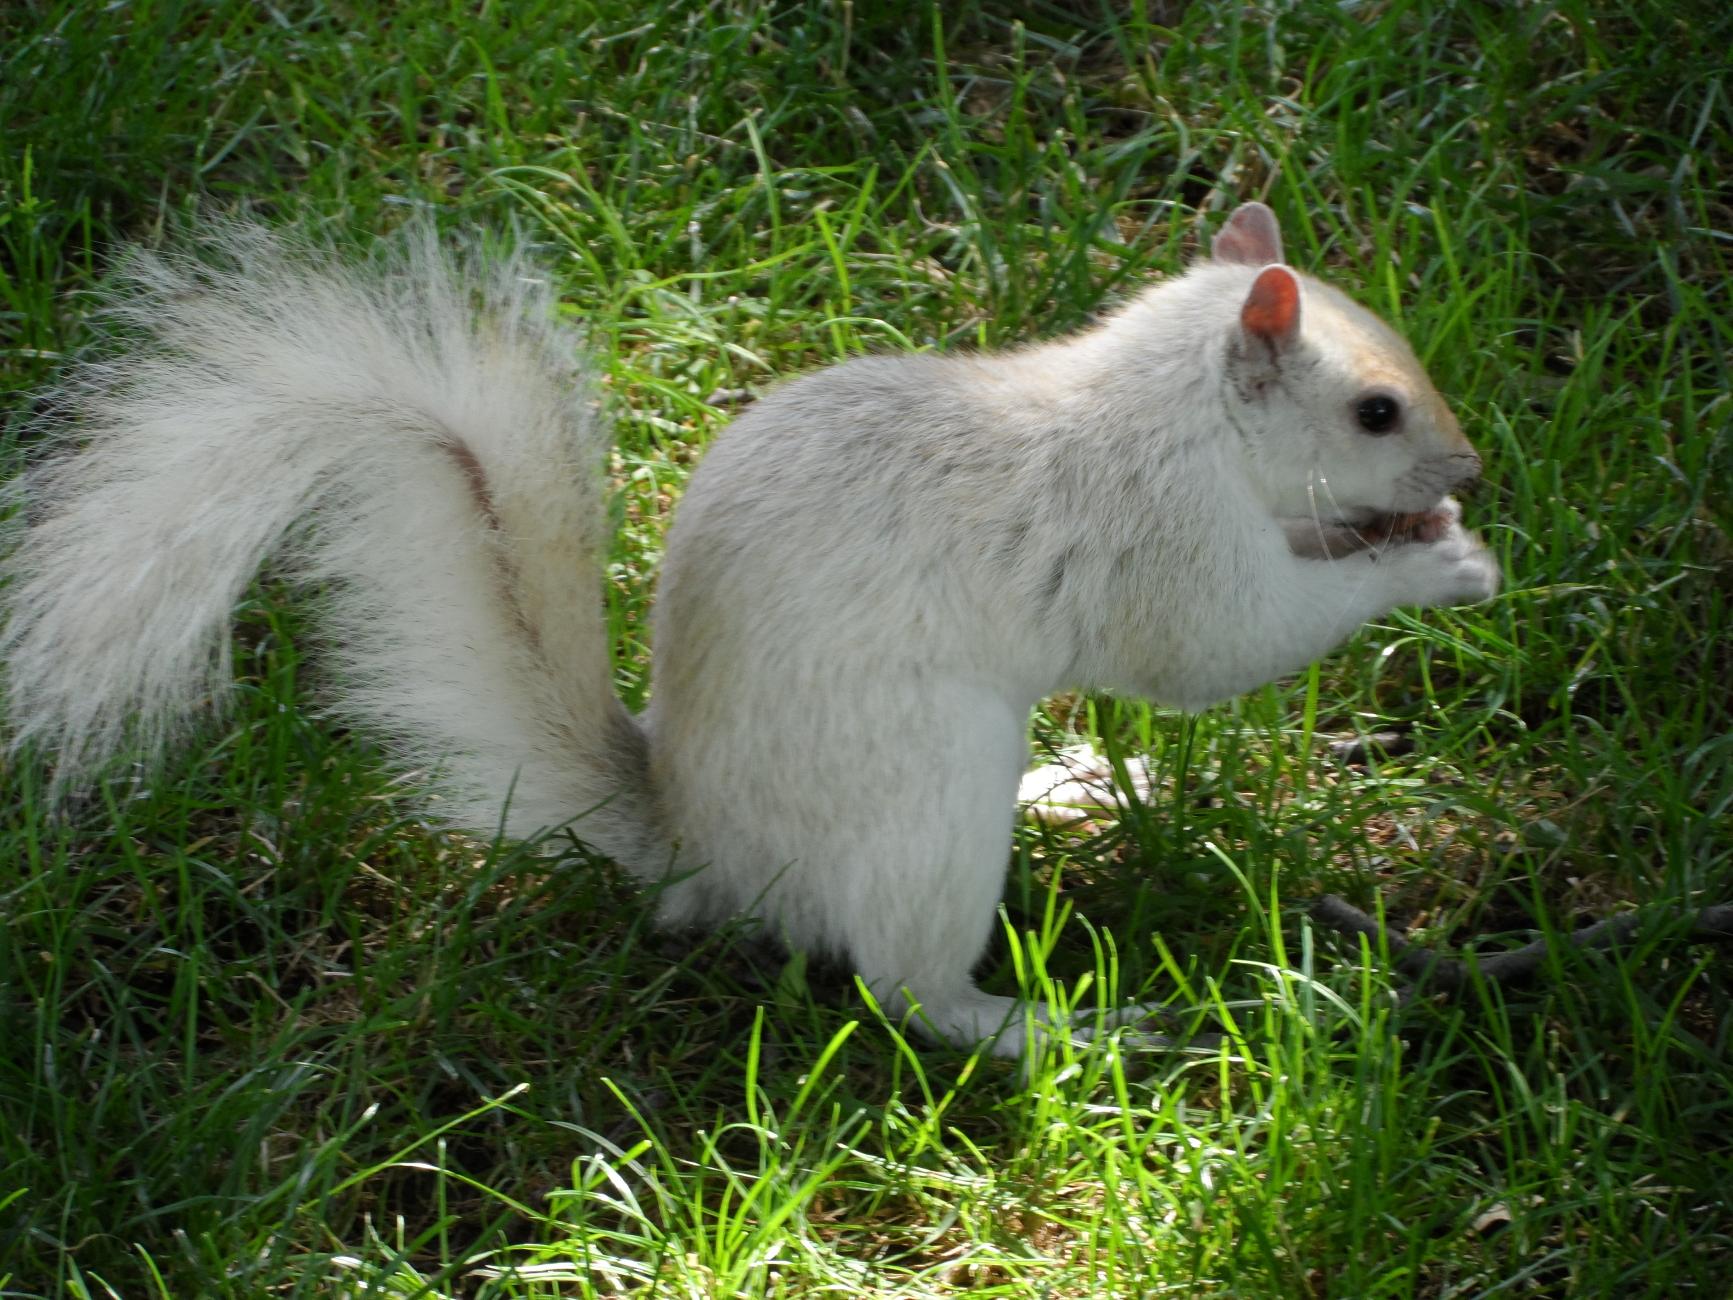 An Albino Squirrel in Boston Commons Park